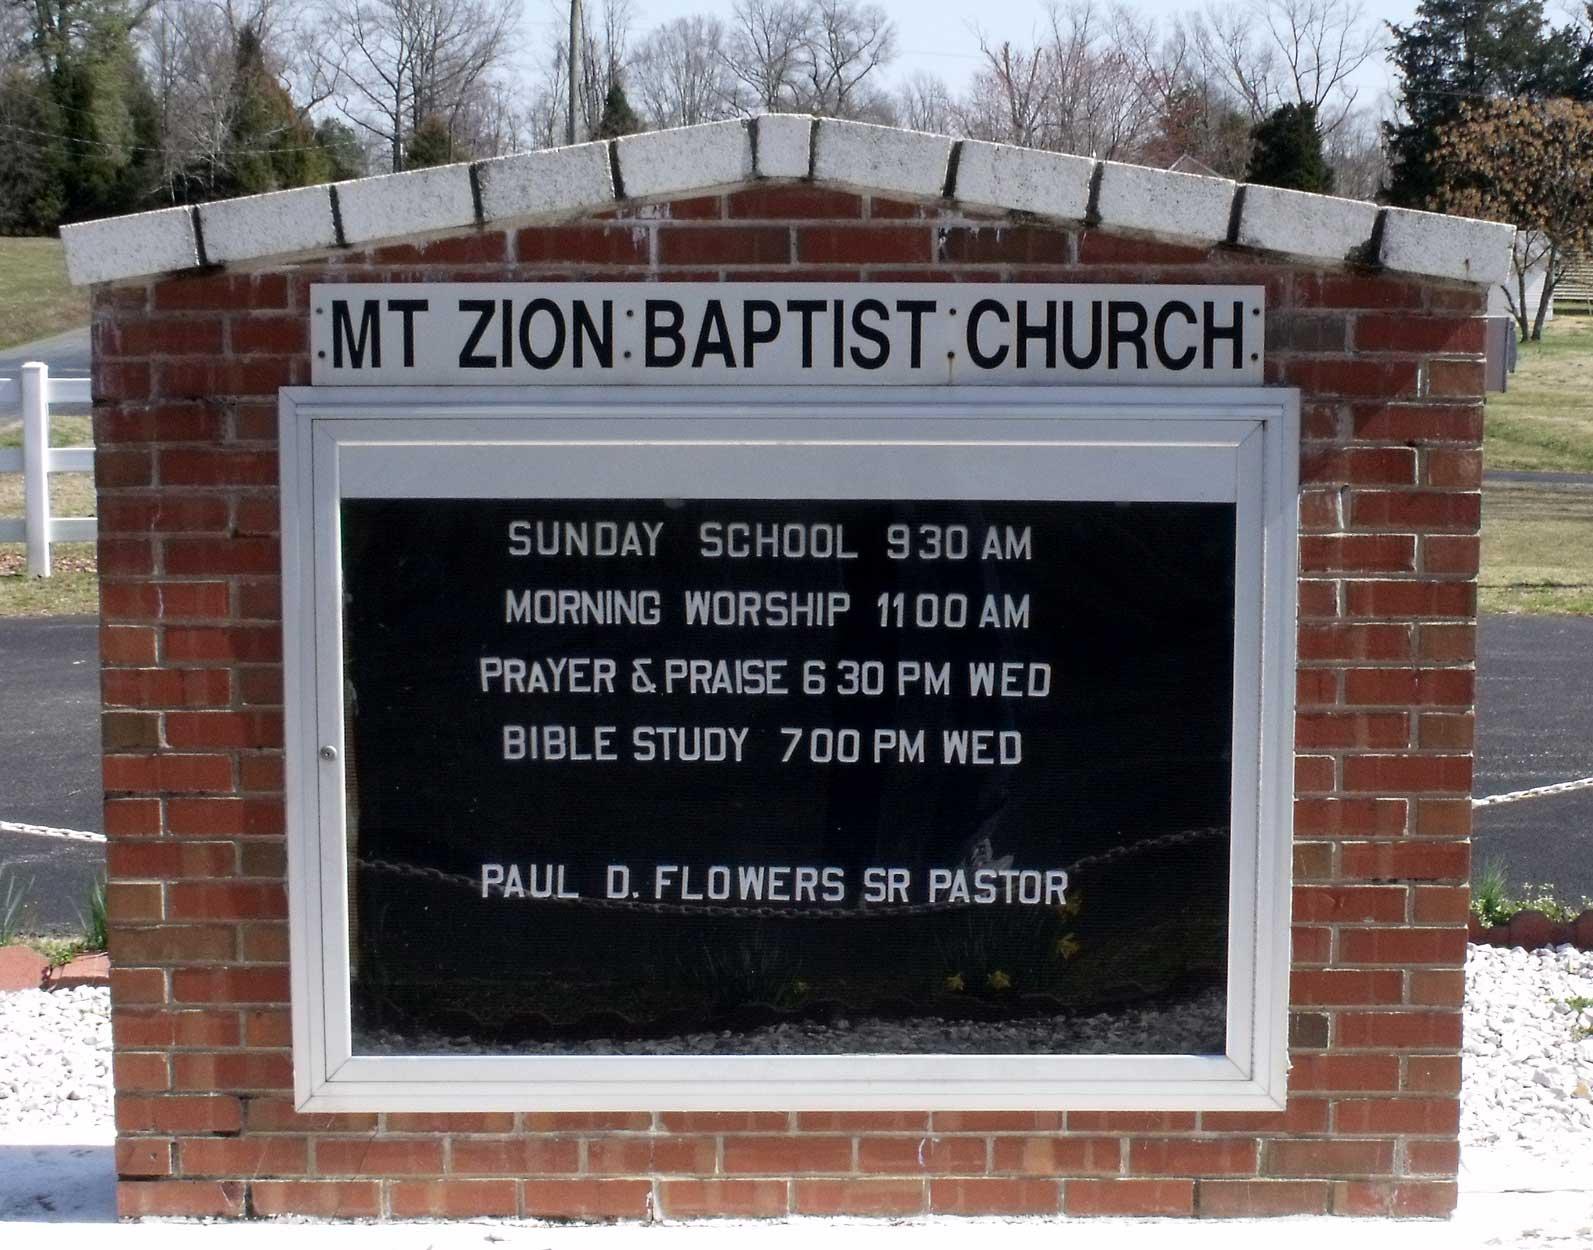 mount zion baptist church cemetery in mechanicsville virginia